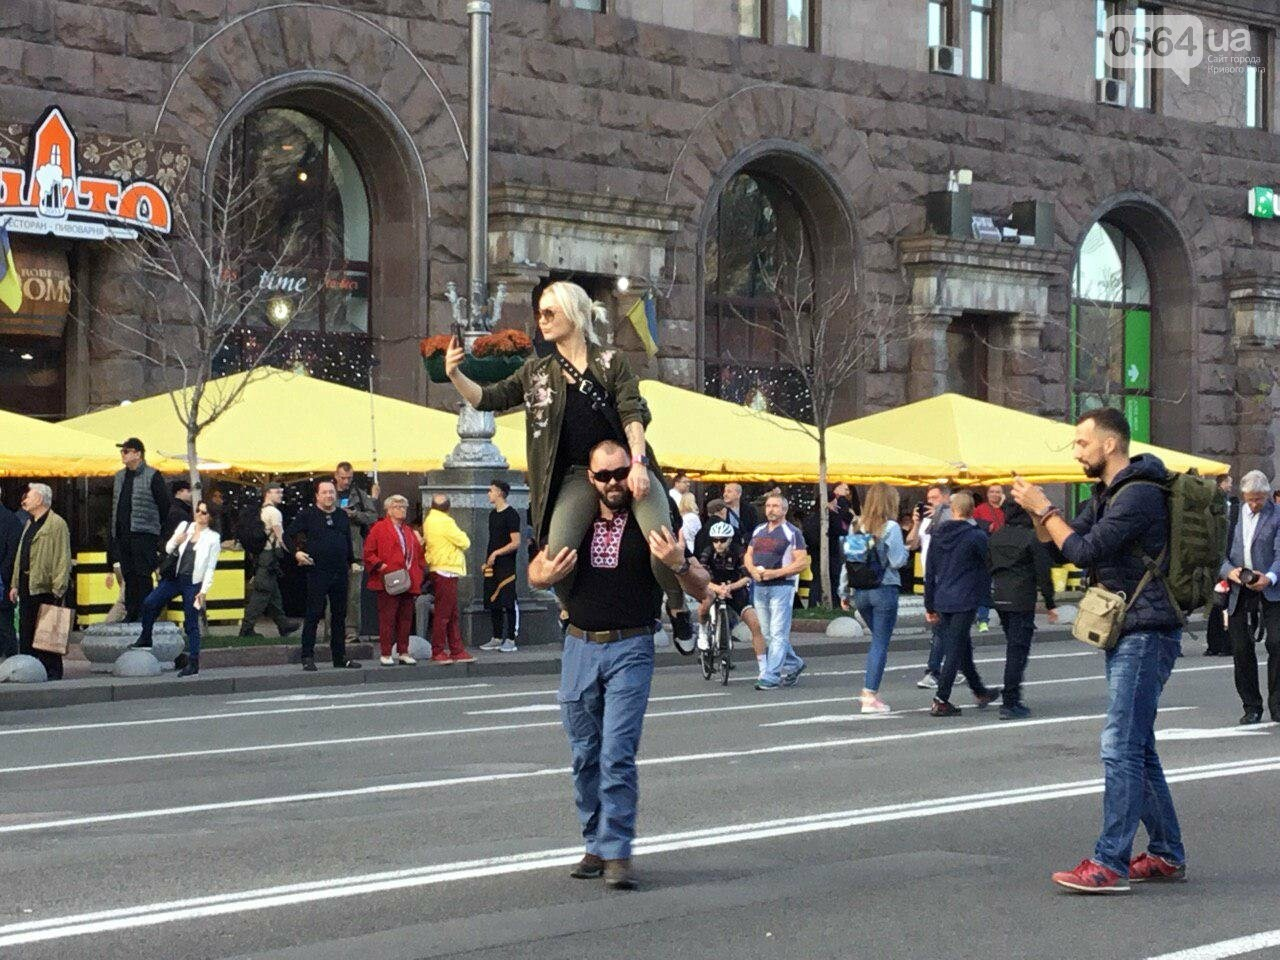 Криворожане поддержали Марш сопротивления капитуляции в Киеве, - ФОТО, ВИДЕО, ОБНОВЛЕНО, фото-19